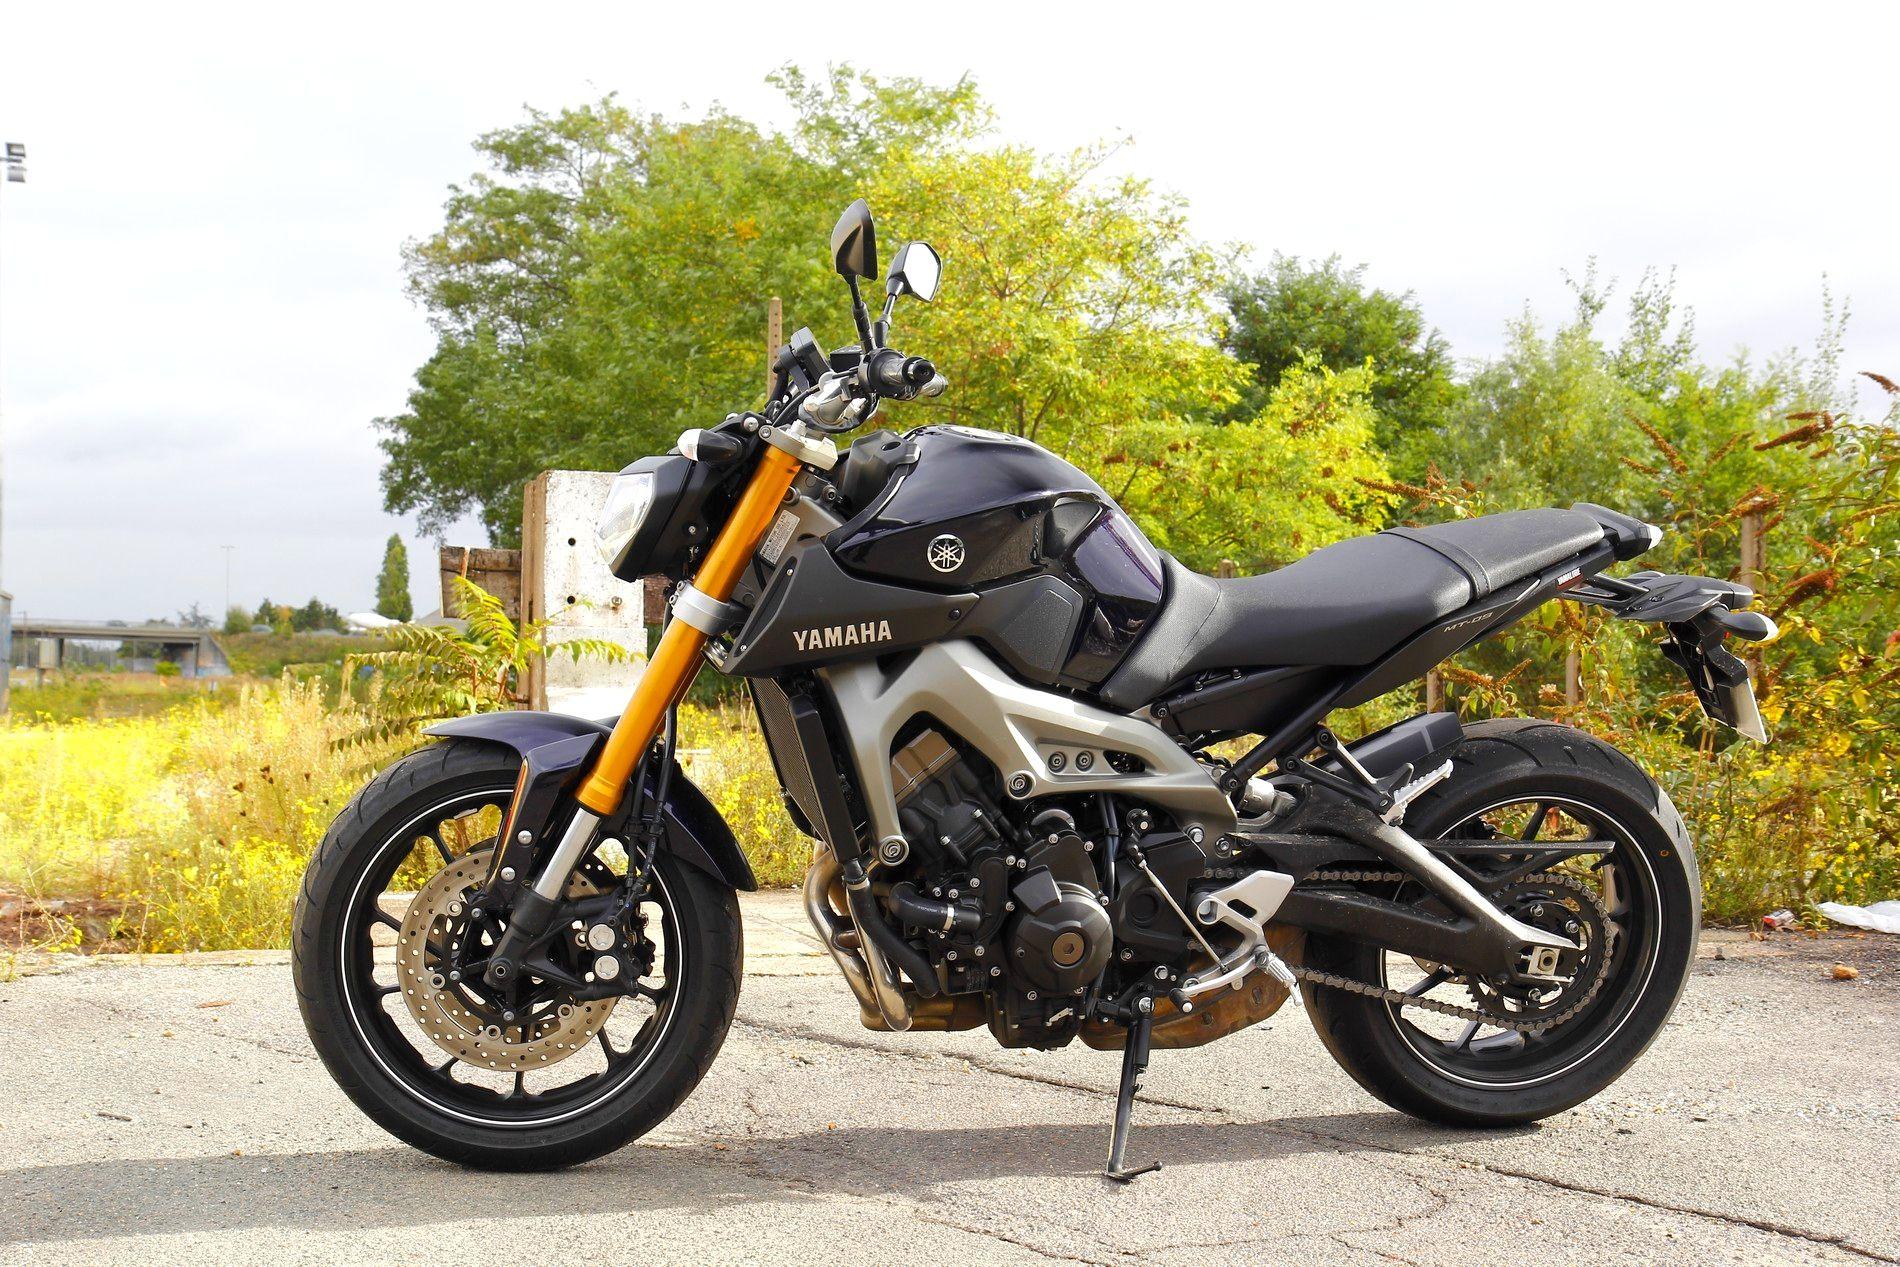 Moto yamaha scrambler cars motorcycles bobber forward mt09 yamaha - Yamaha Mt 09